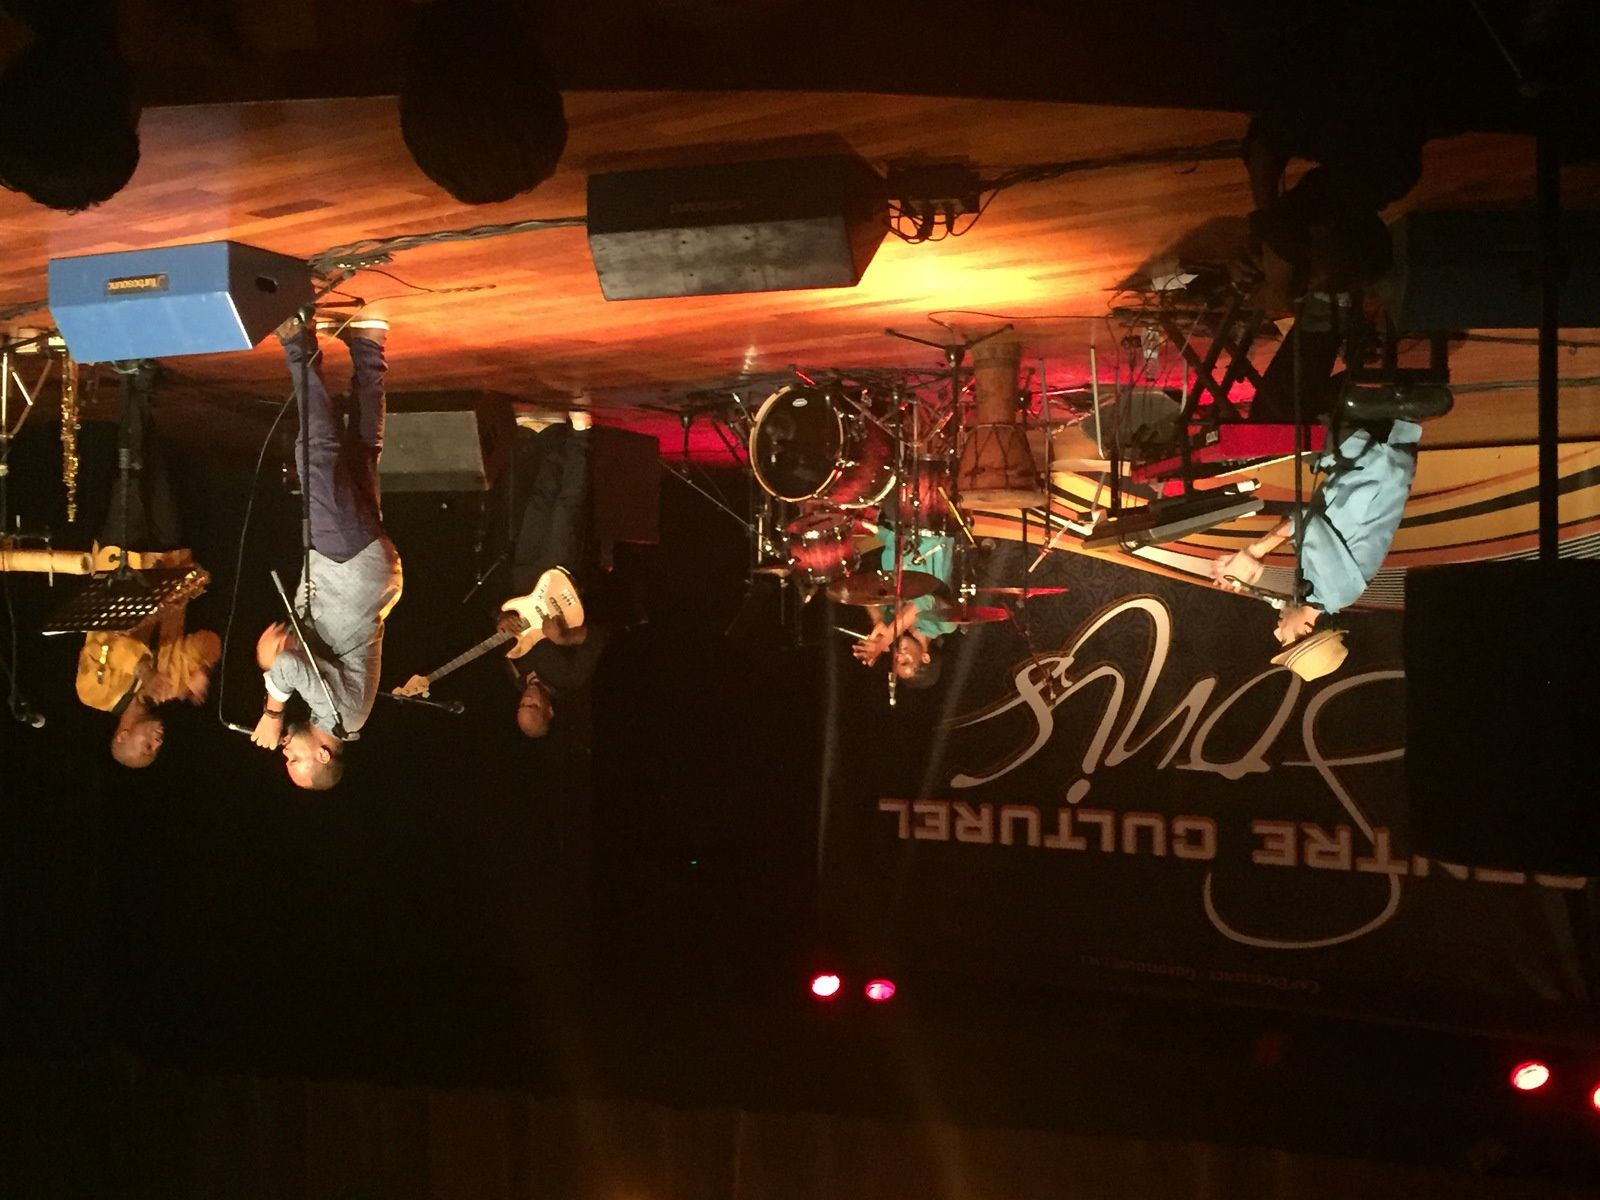 Urban Twoubadoo en concert à SONIS le vendredi 22 avril 2016